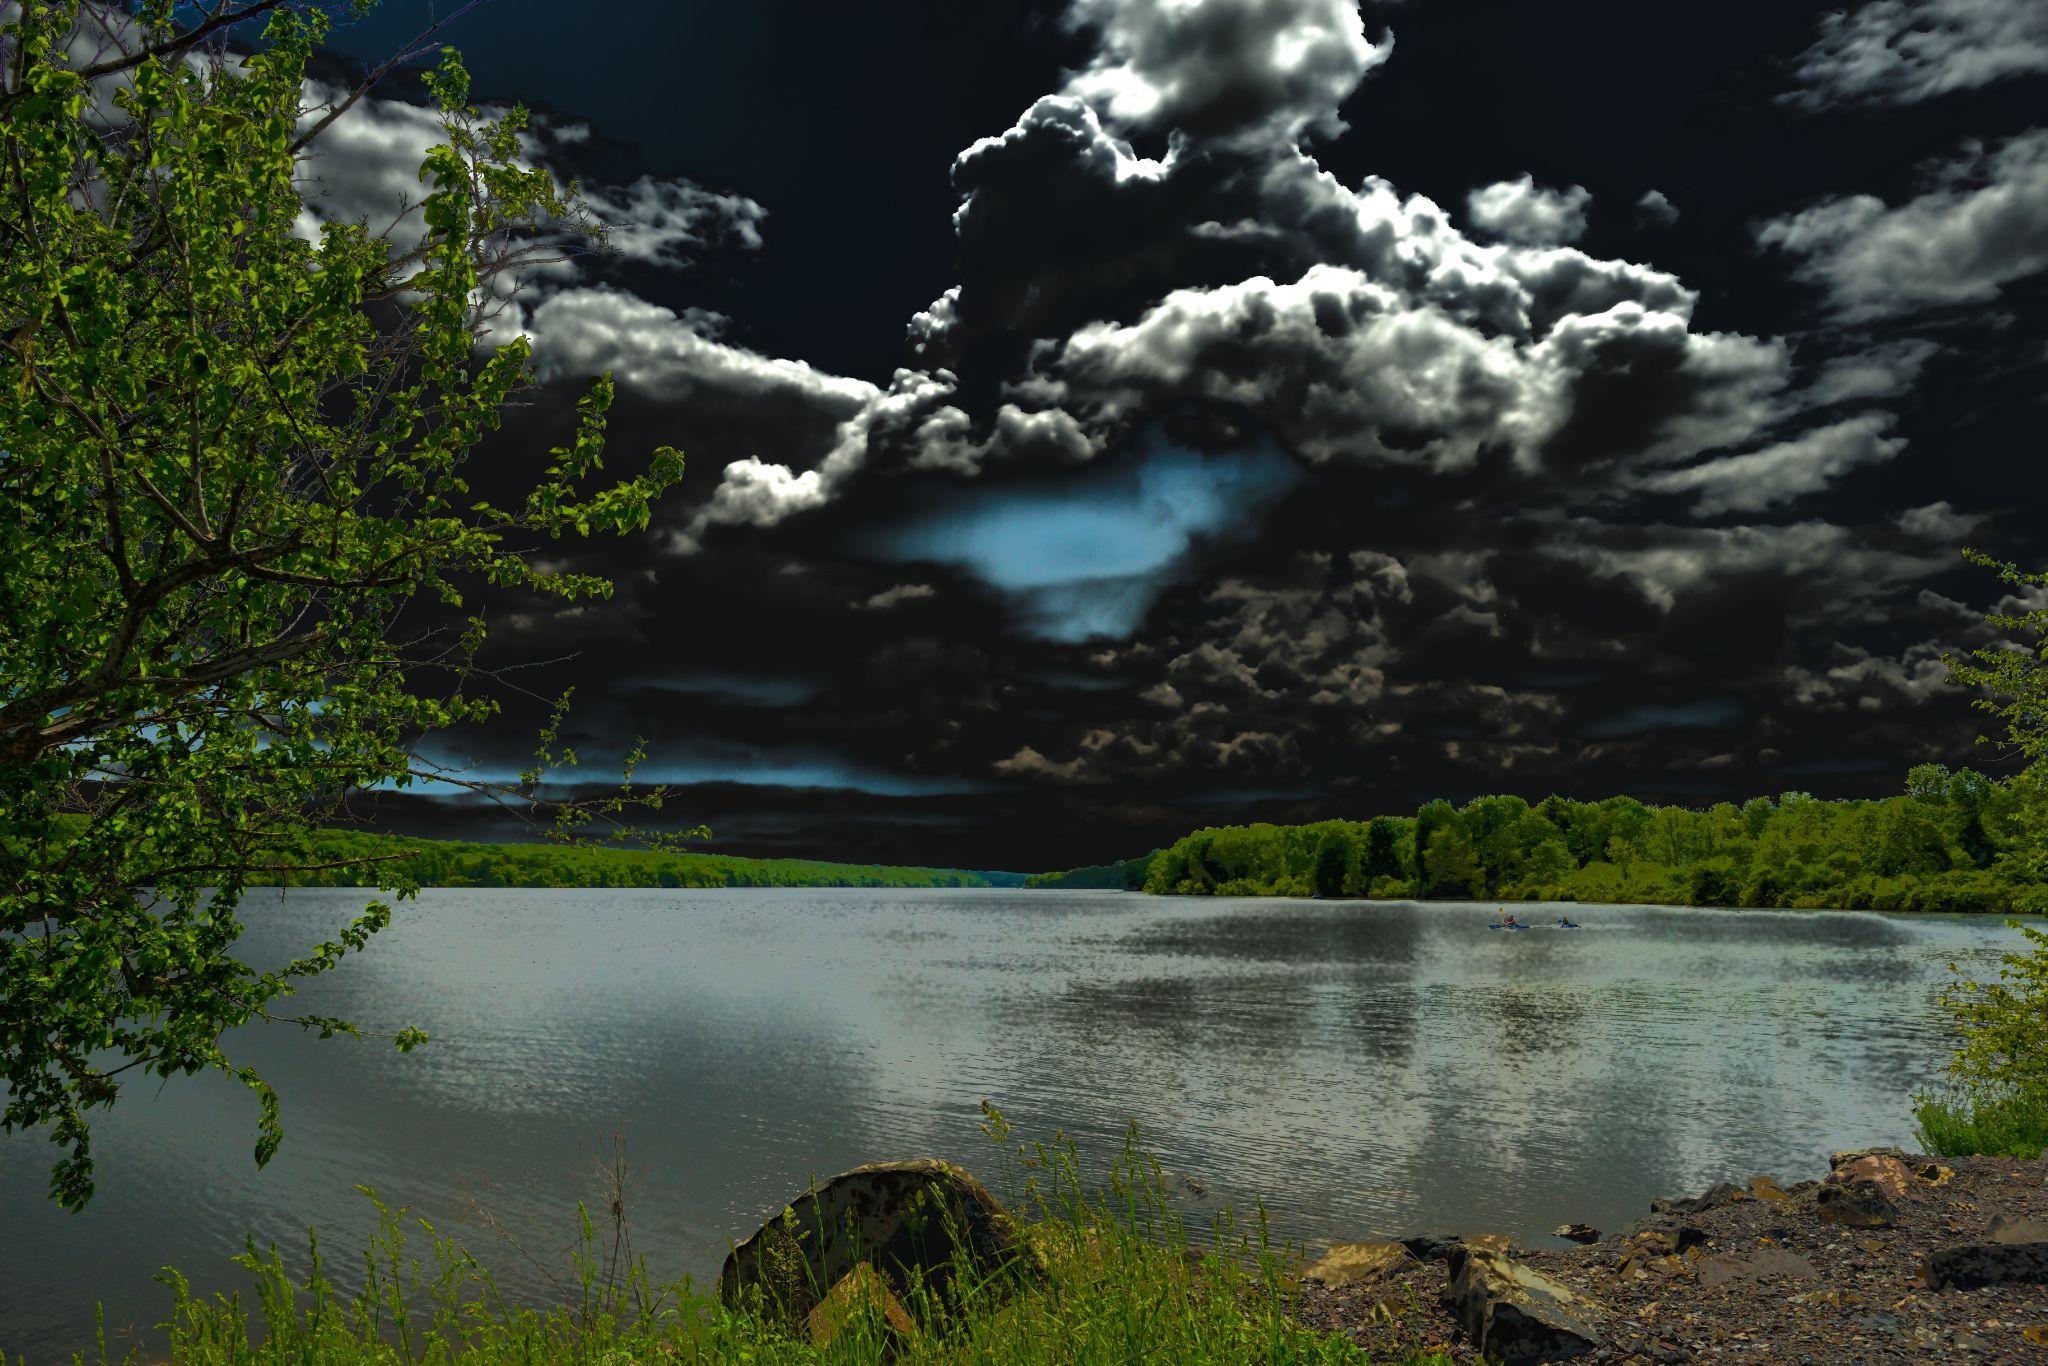 Nokamixon State Park - brooding sky by Second-Glimpse Photography